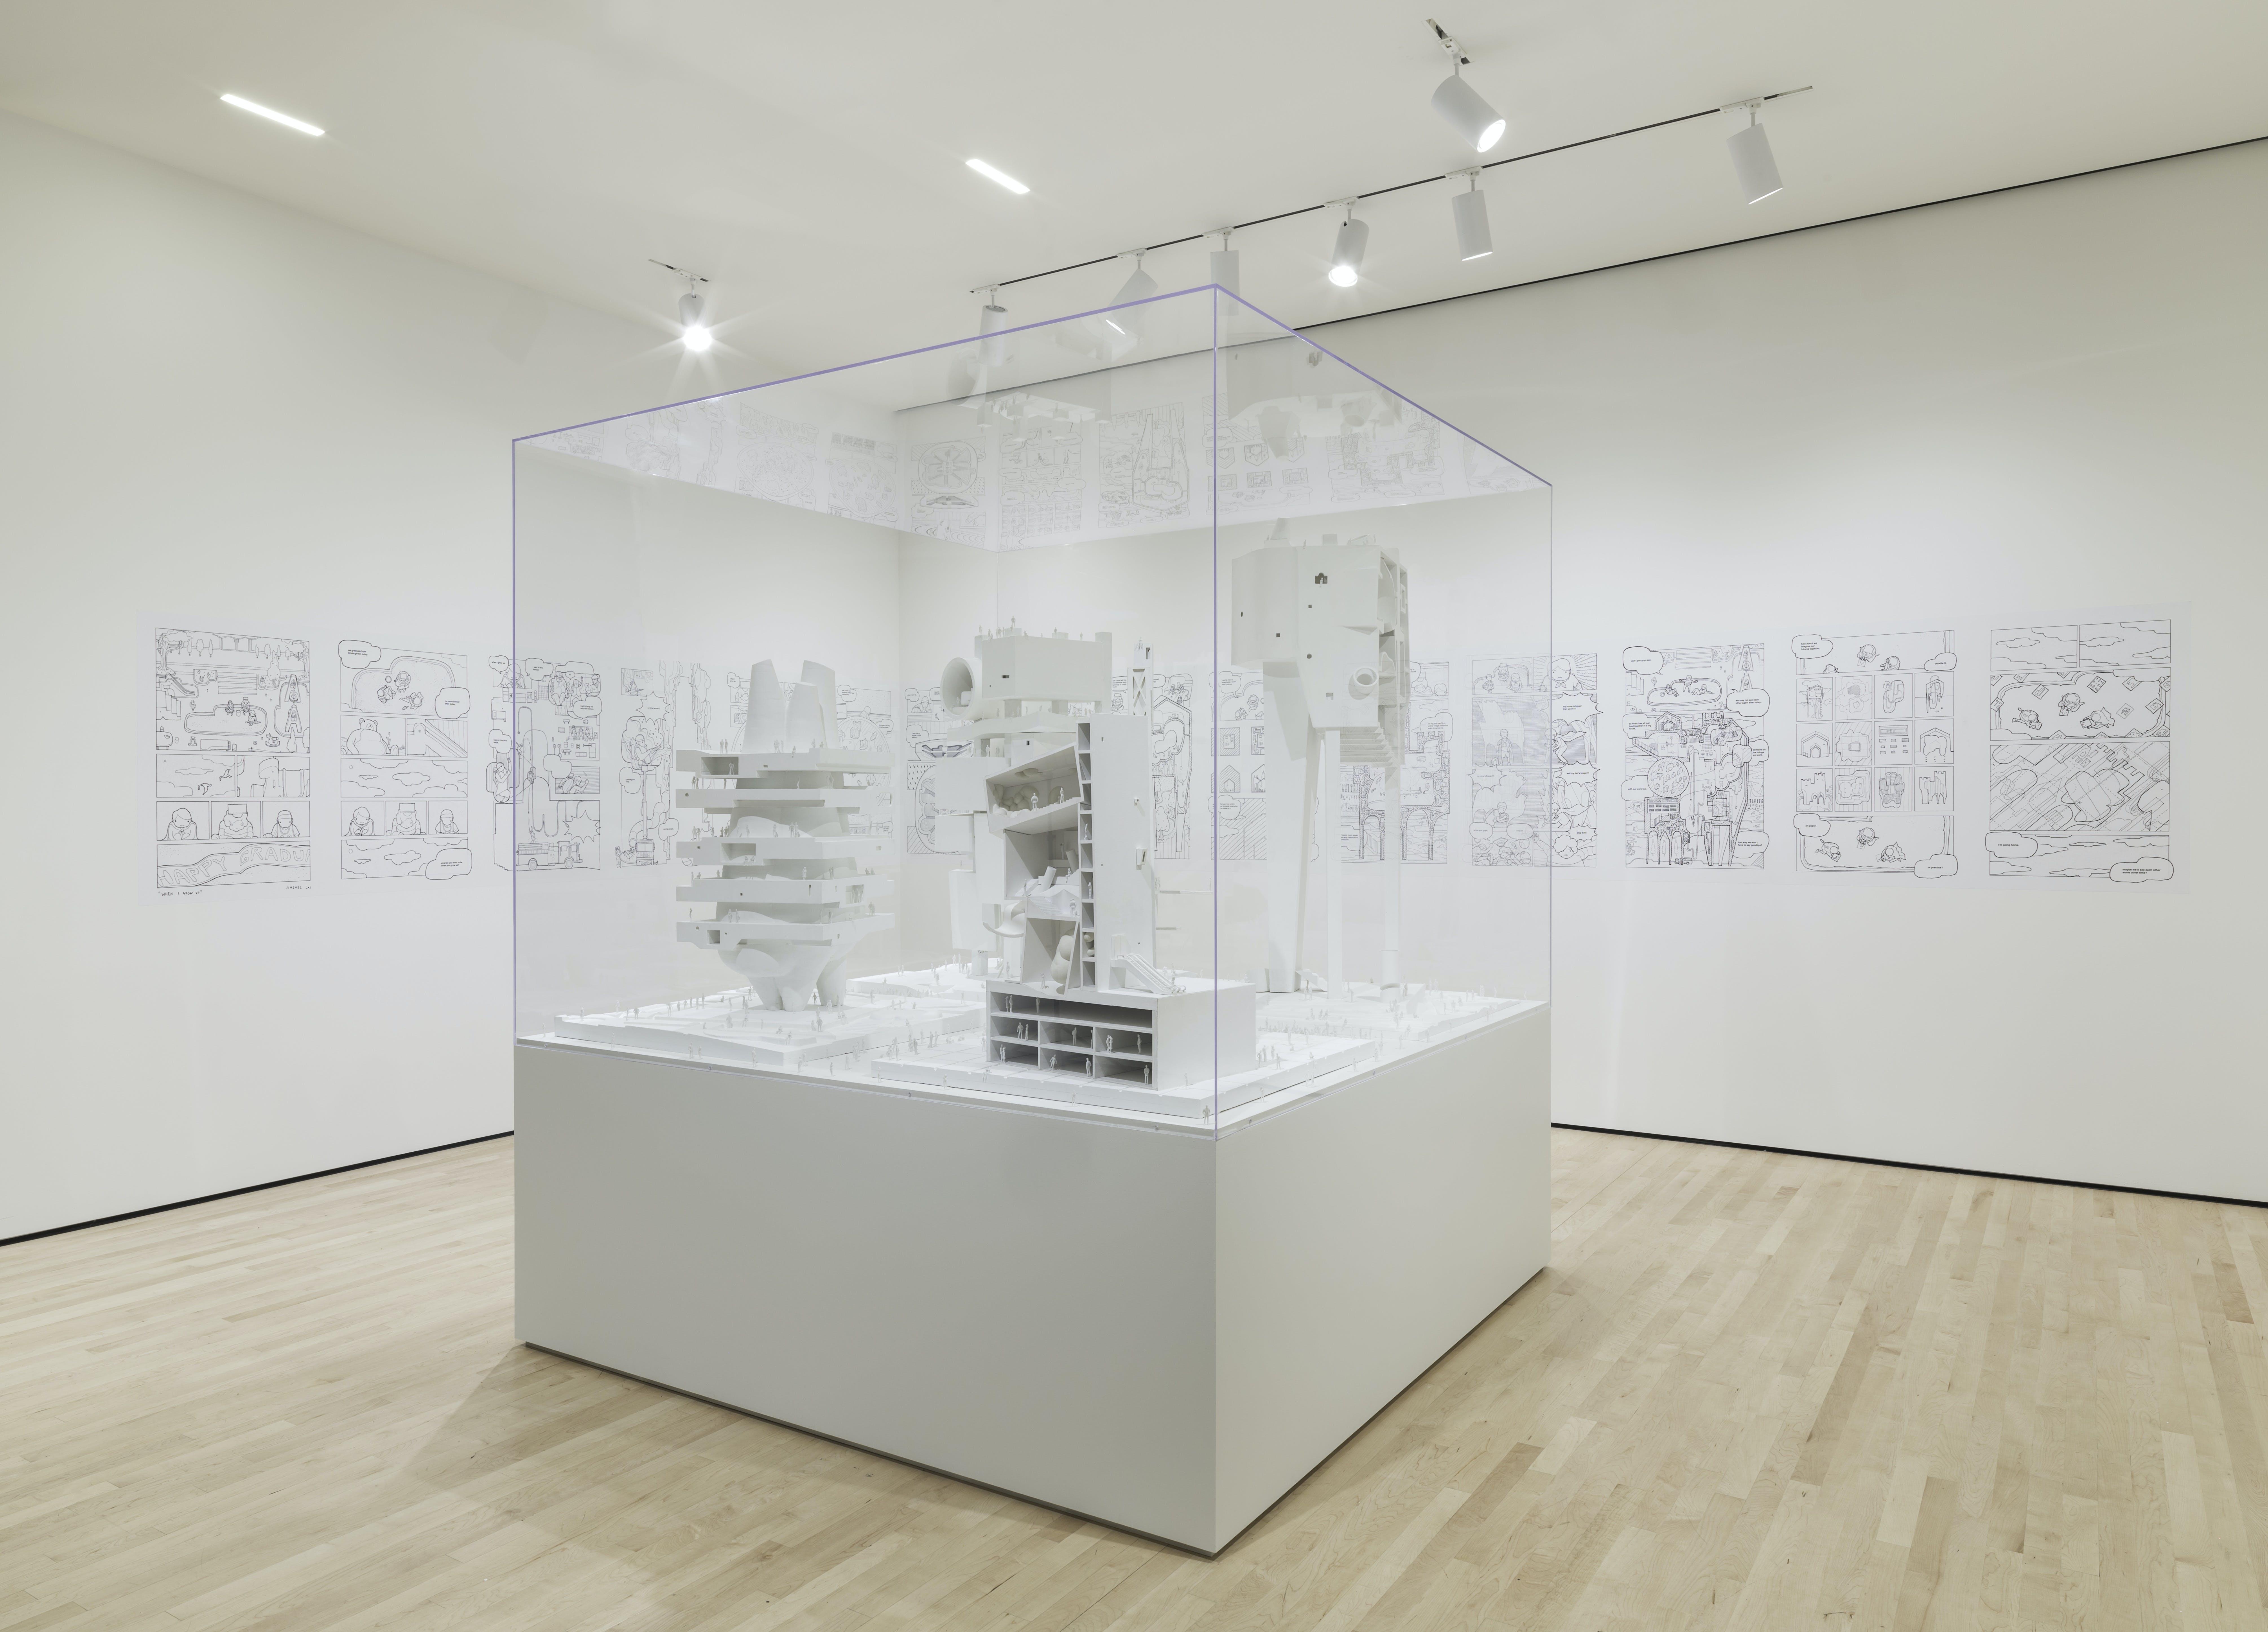 New bureau spectacular exhibition at sfmoma explores the narrative